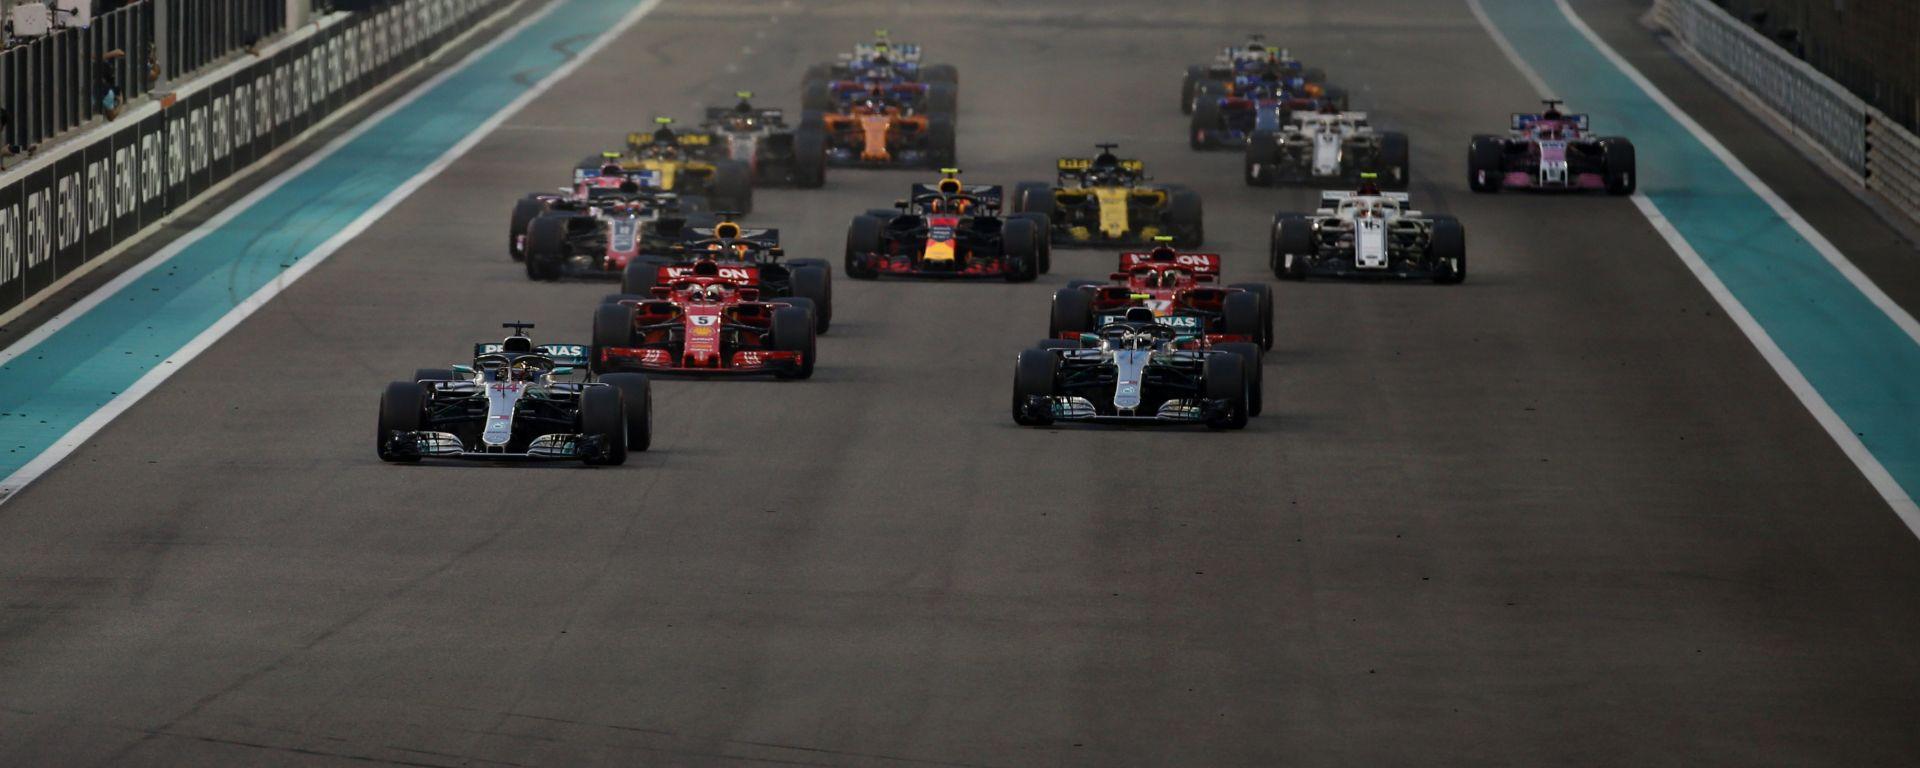 F1 GP Abu Dhabi 2018, Yas Marina, la partenza